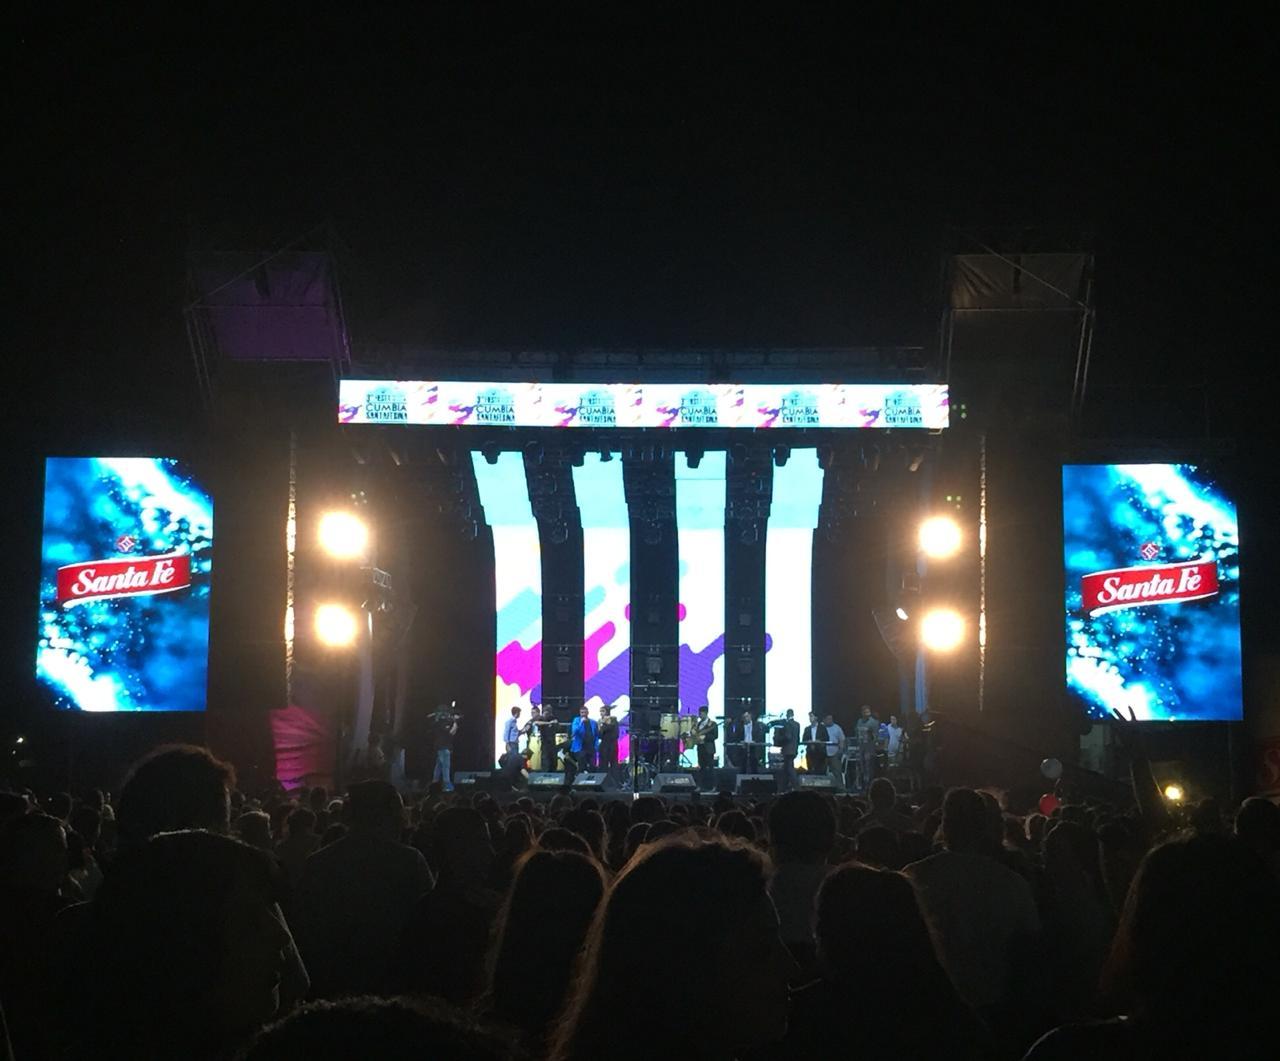 Festival de la Cumbia Santafesina